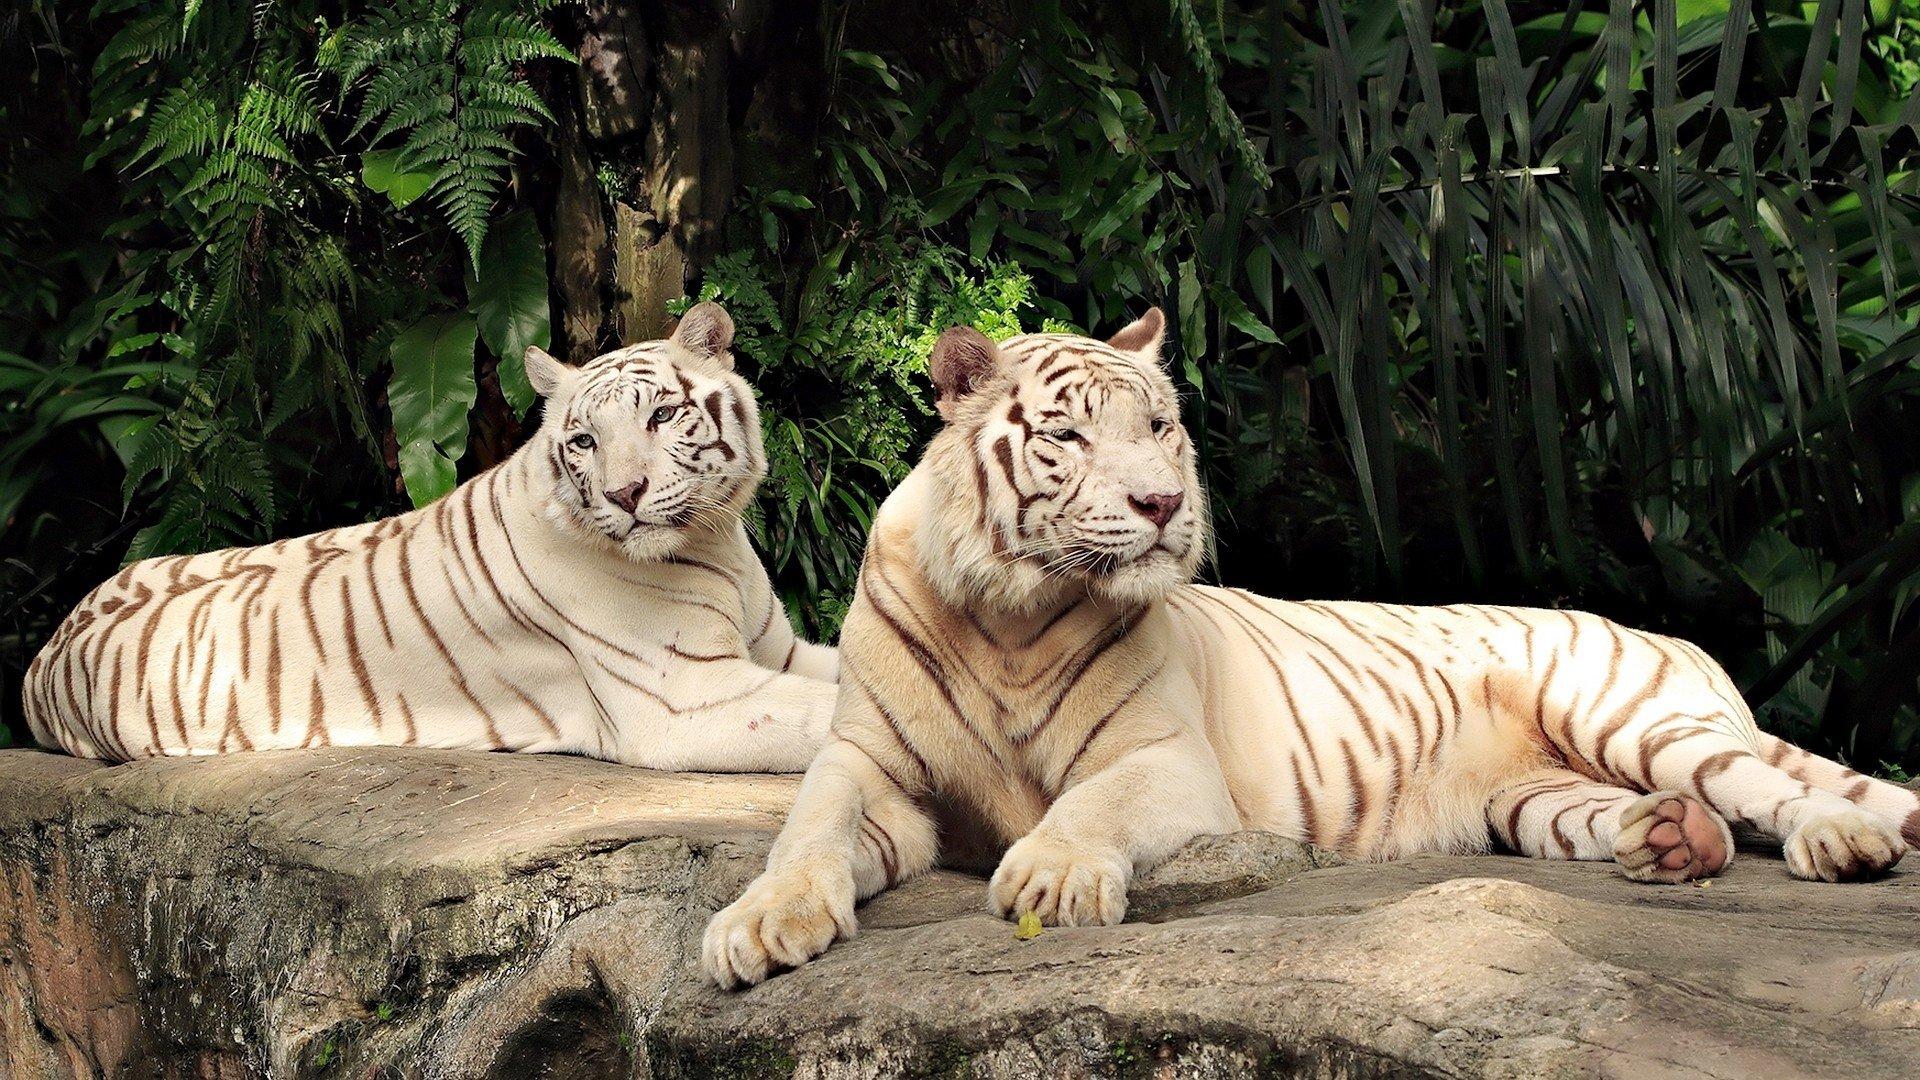 обои на телефон тигрята фотообои